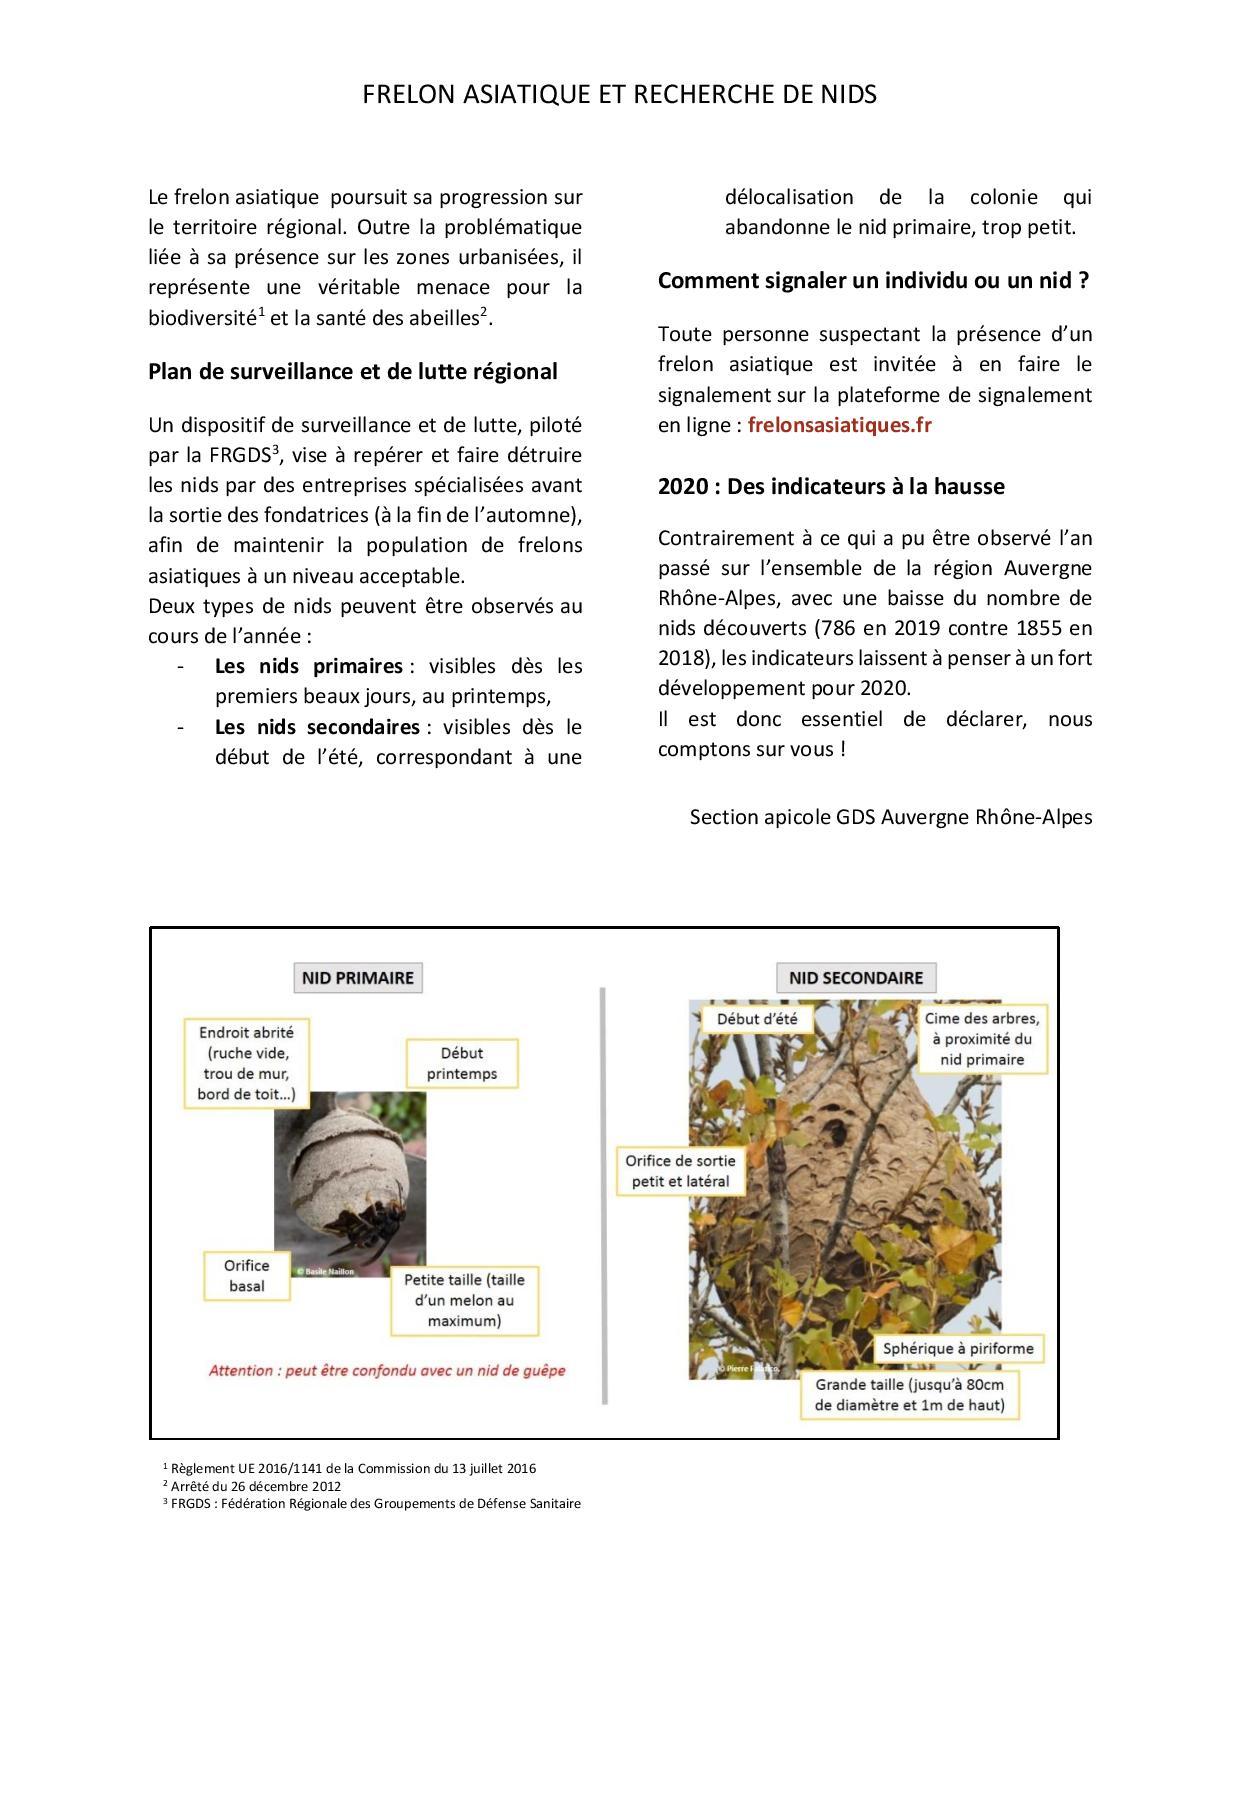 LALUTTECONTRELEFRELONASIATIQUESeptembre2020-page-001.jpg